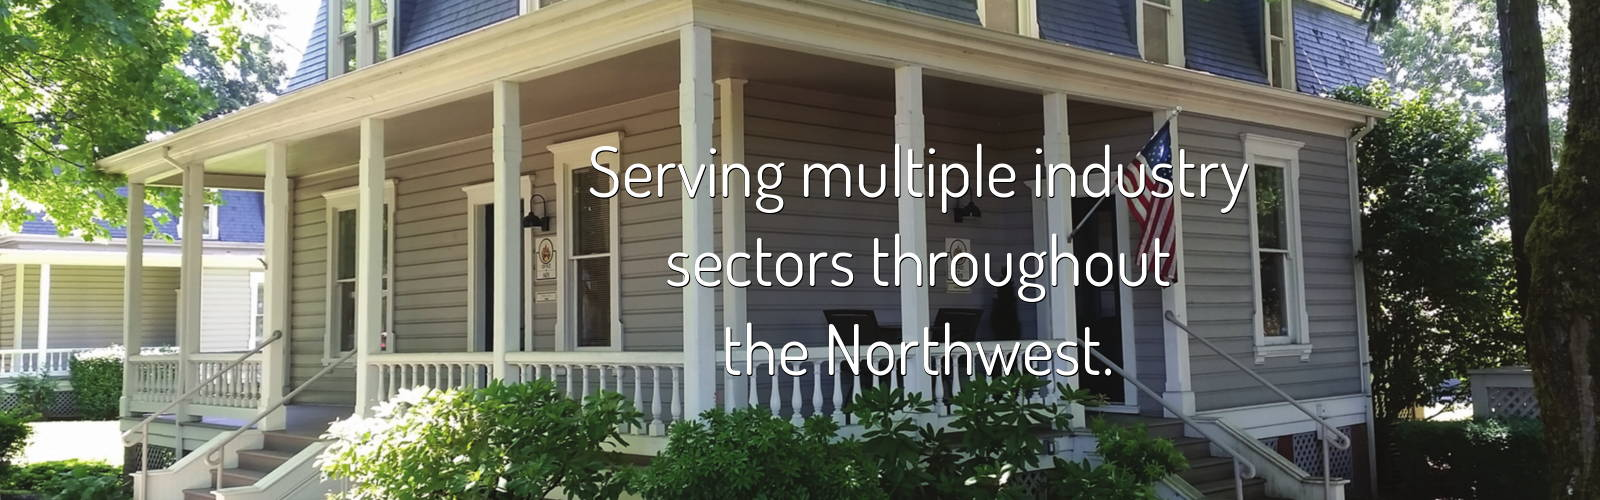 banner-serving-sectors3